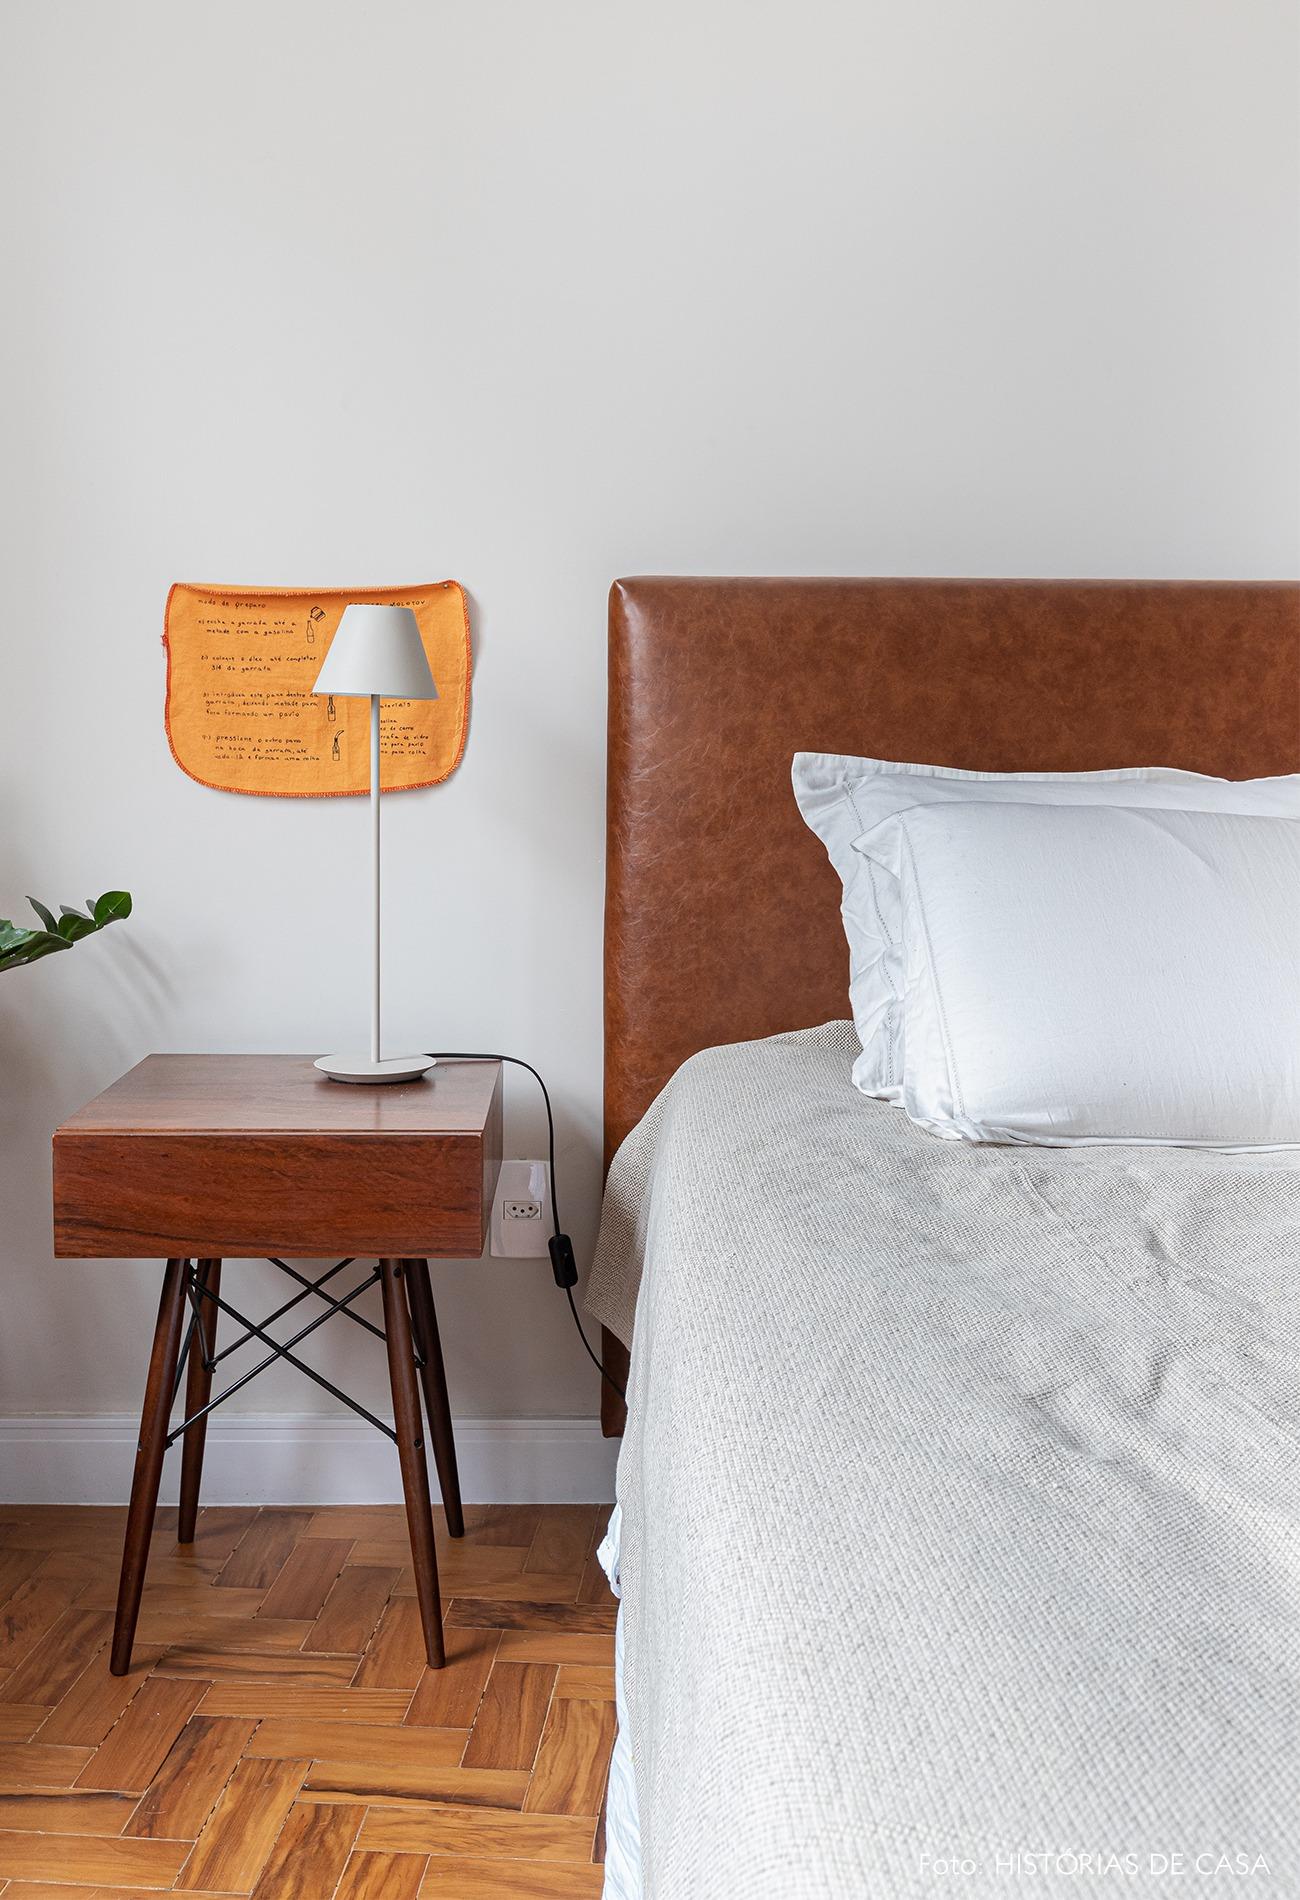 quarto-branco-parede-cama-mesa-lateral-madeira-abajur-branco